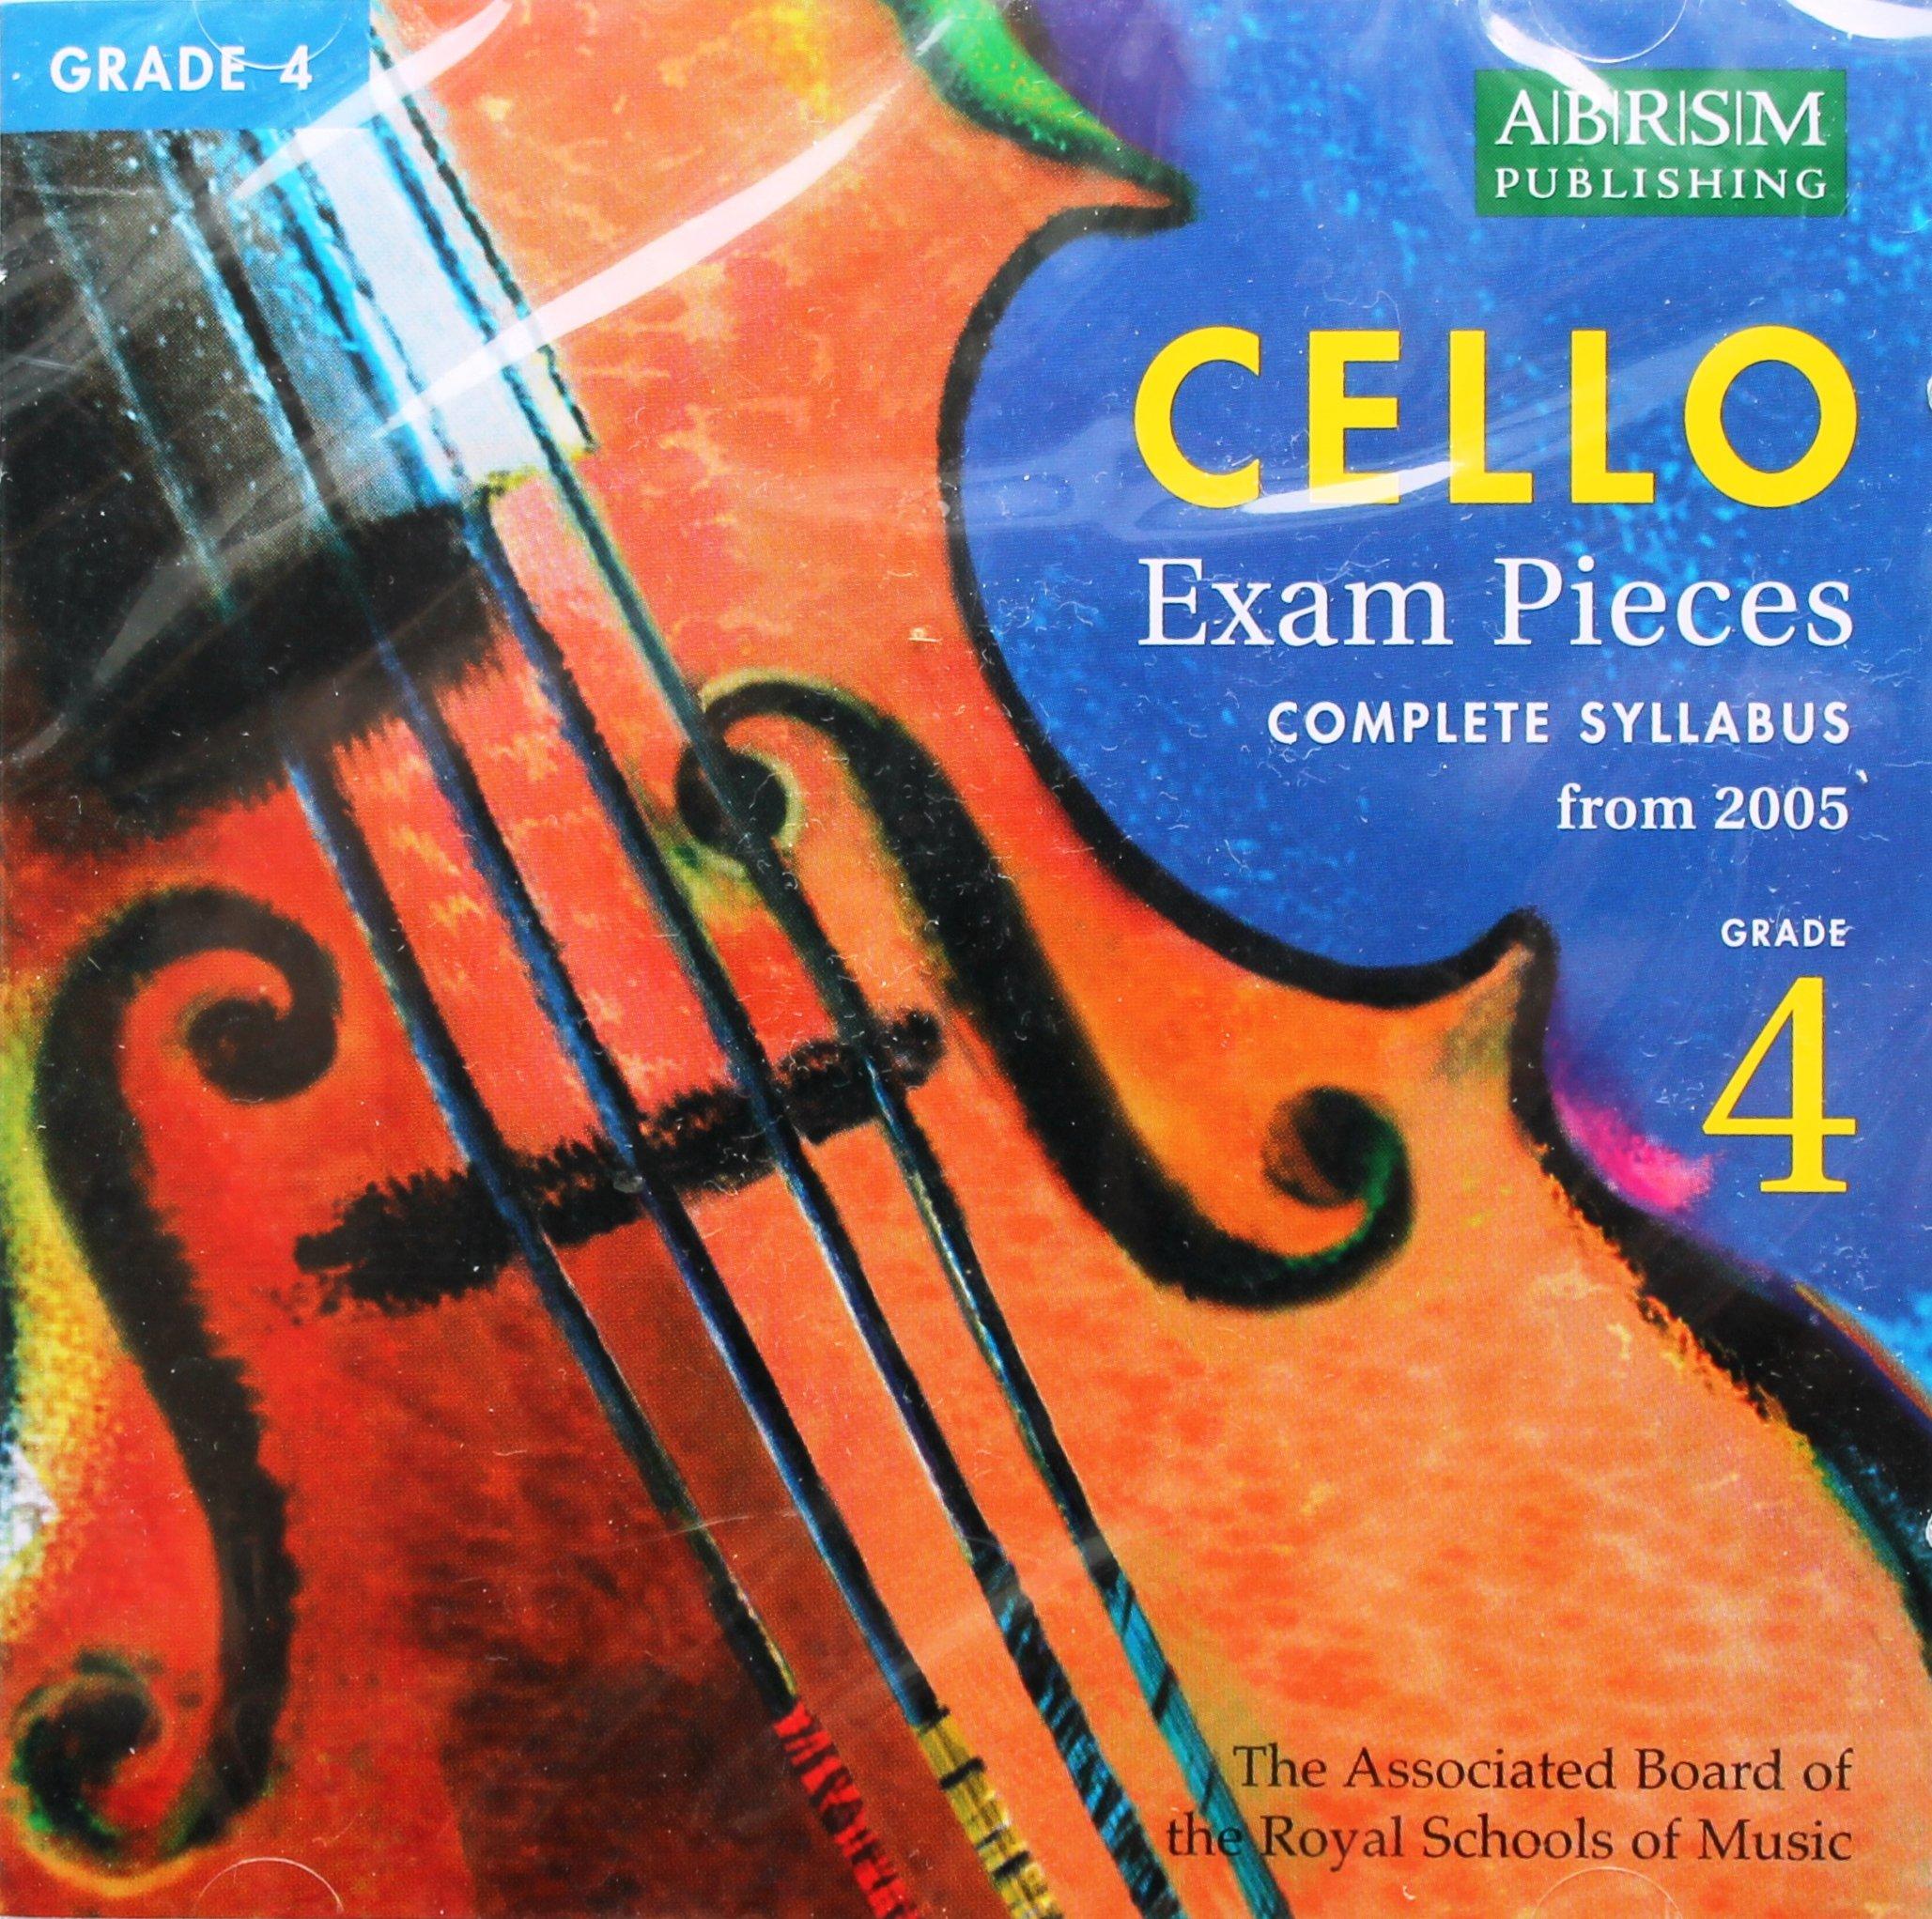 Read Online Cello Exam Pieces from 2005 Grade 4 pdf